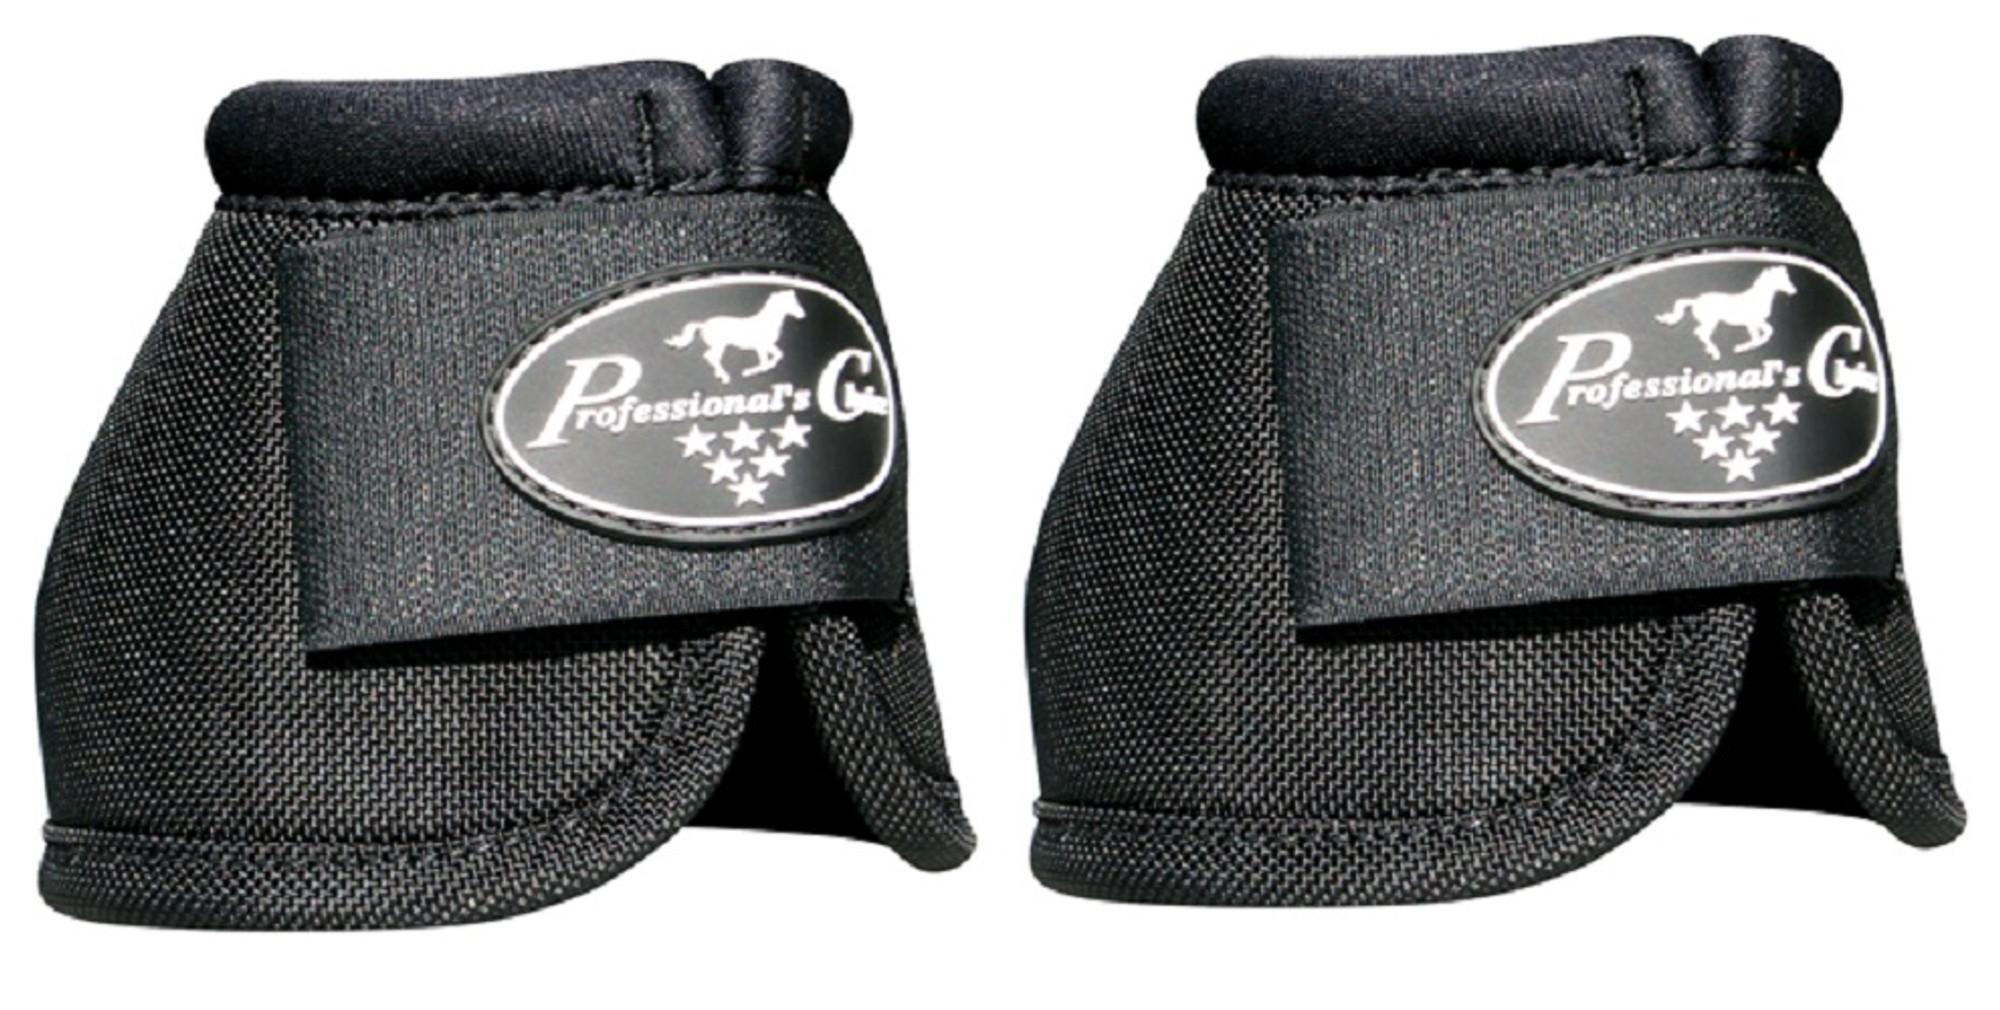 Professionals Choice Horse Equine Overreach Ballistic Bell Boots Ranchero